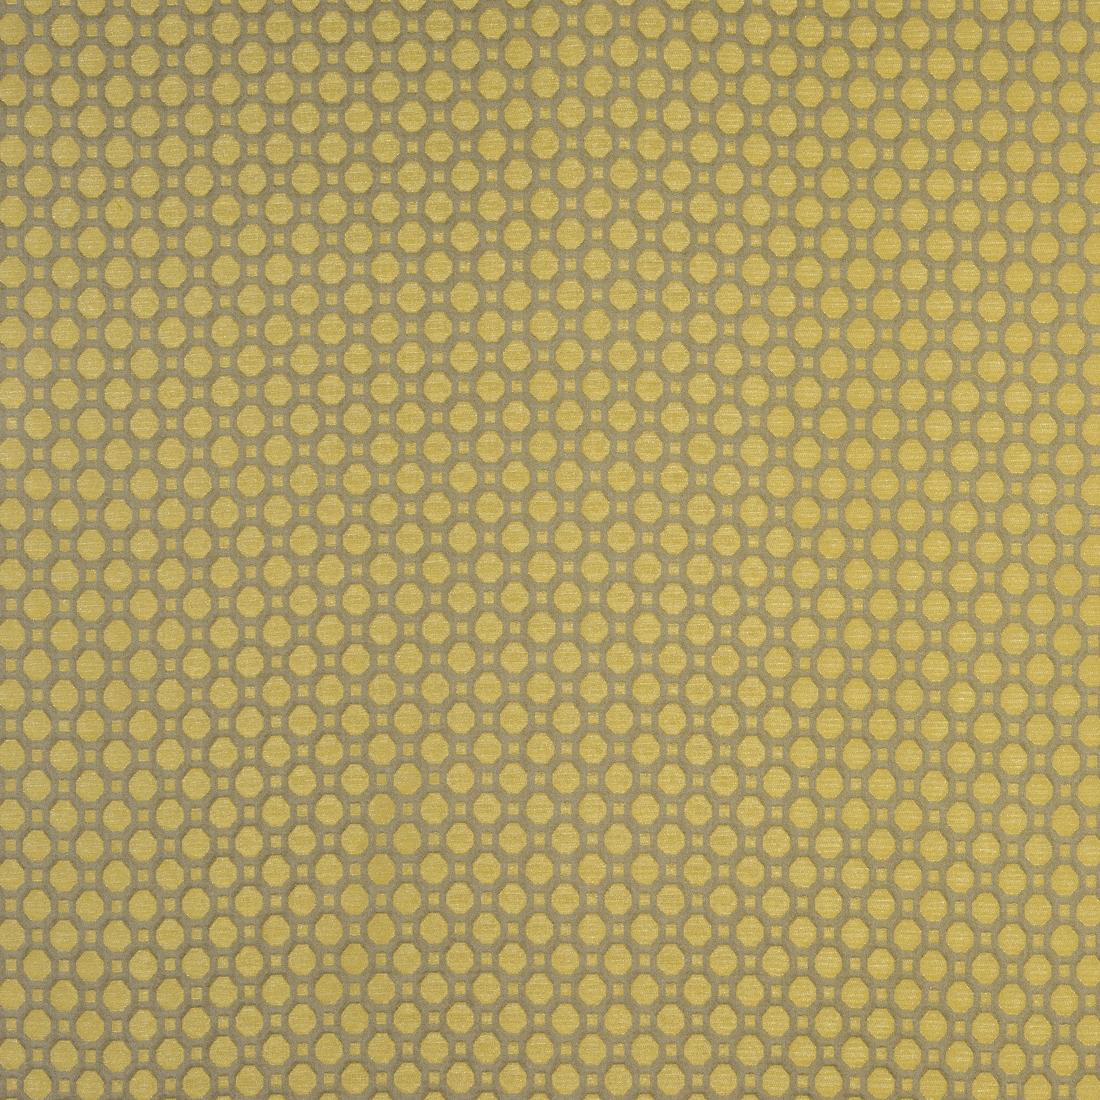 honeycomb ochre